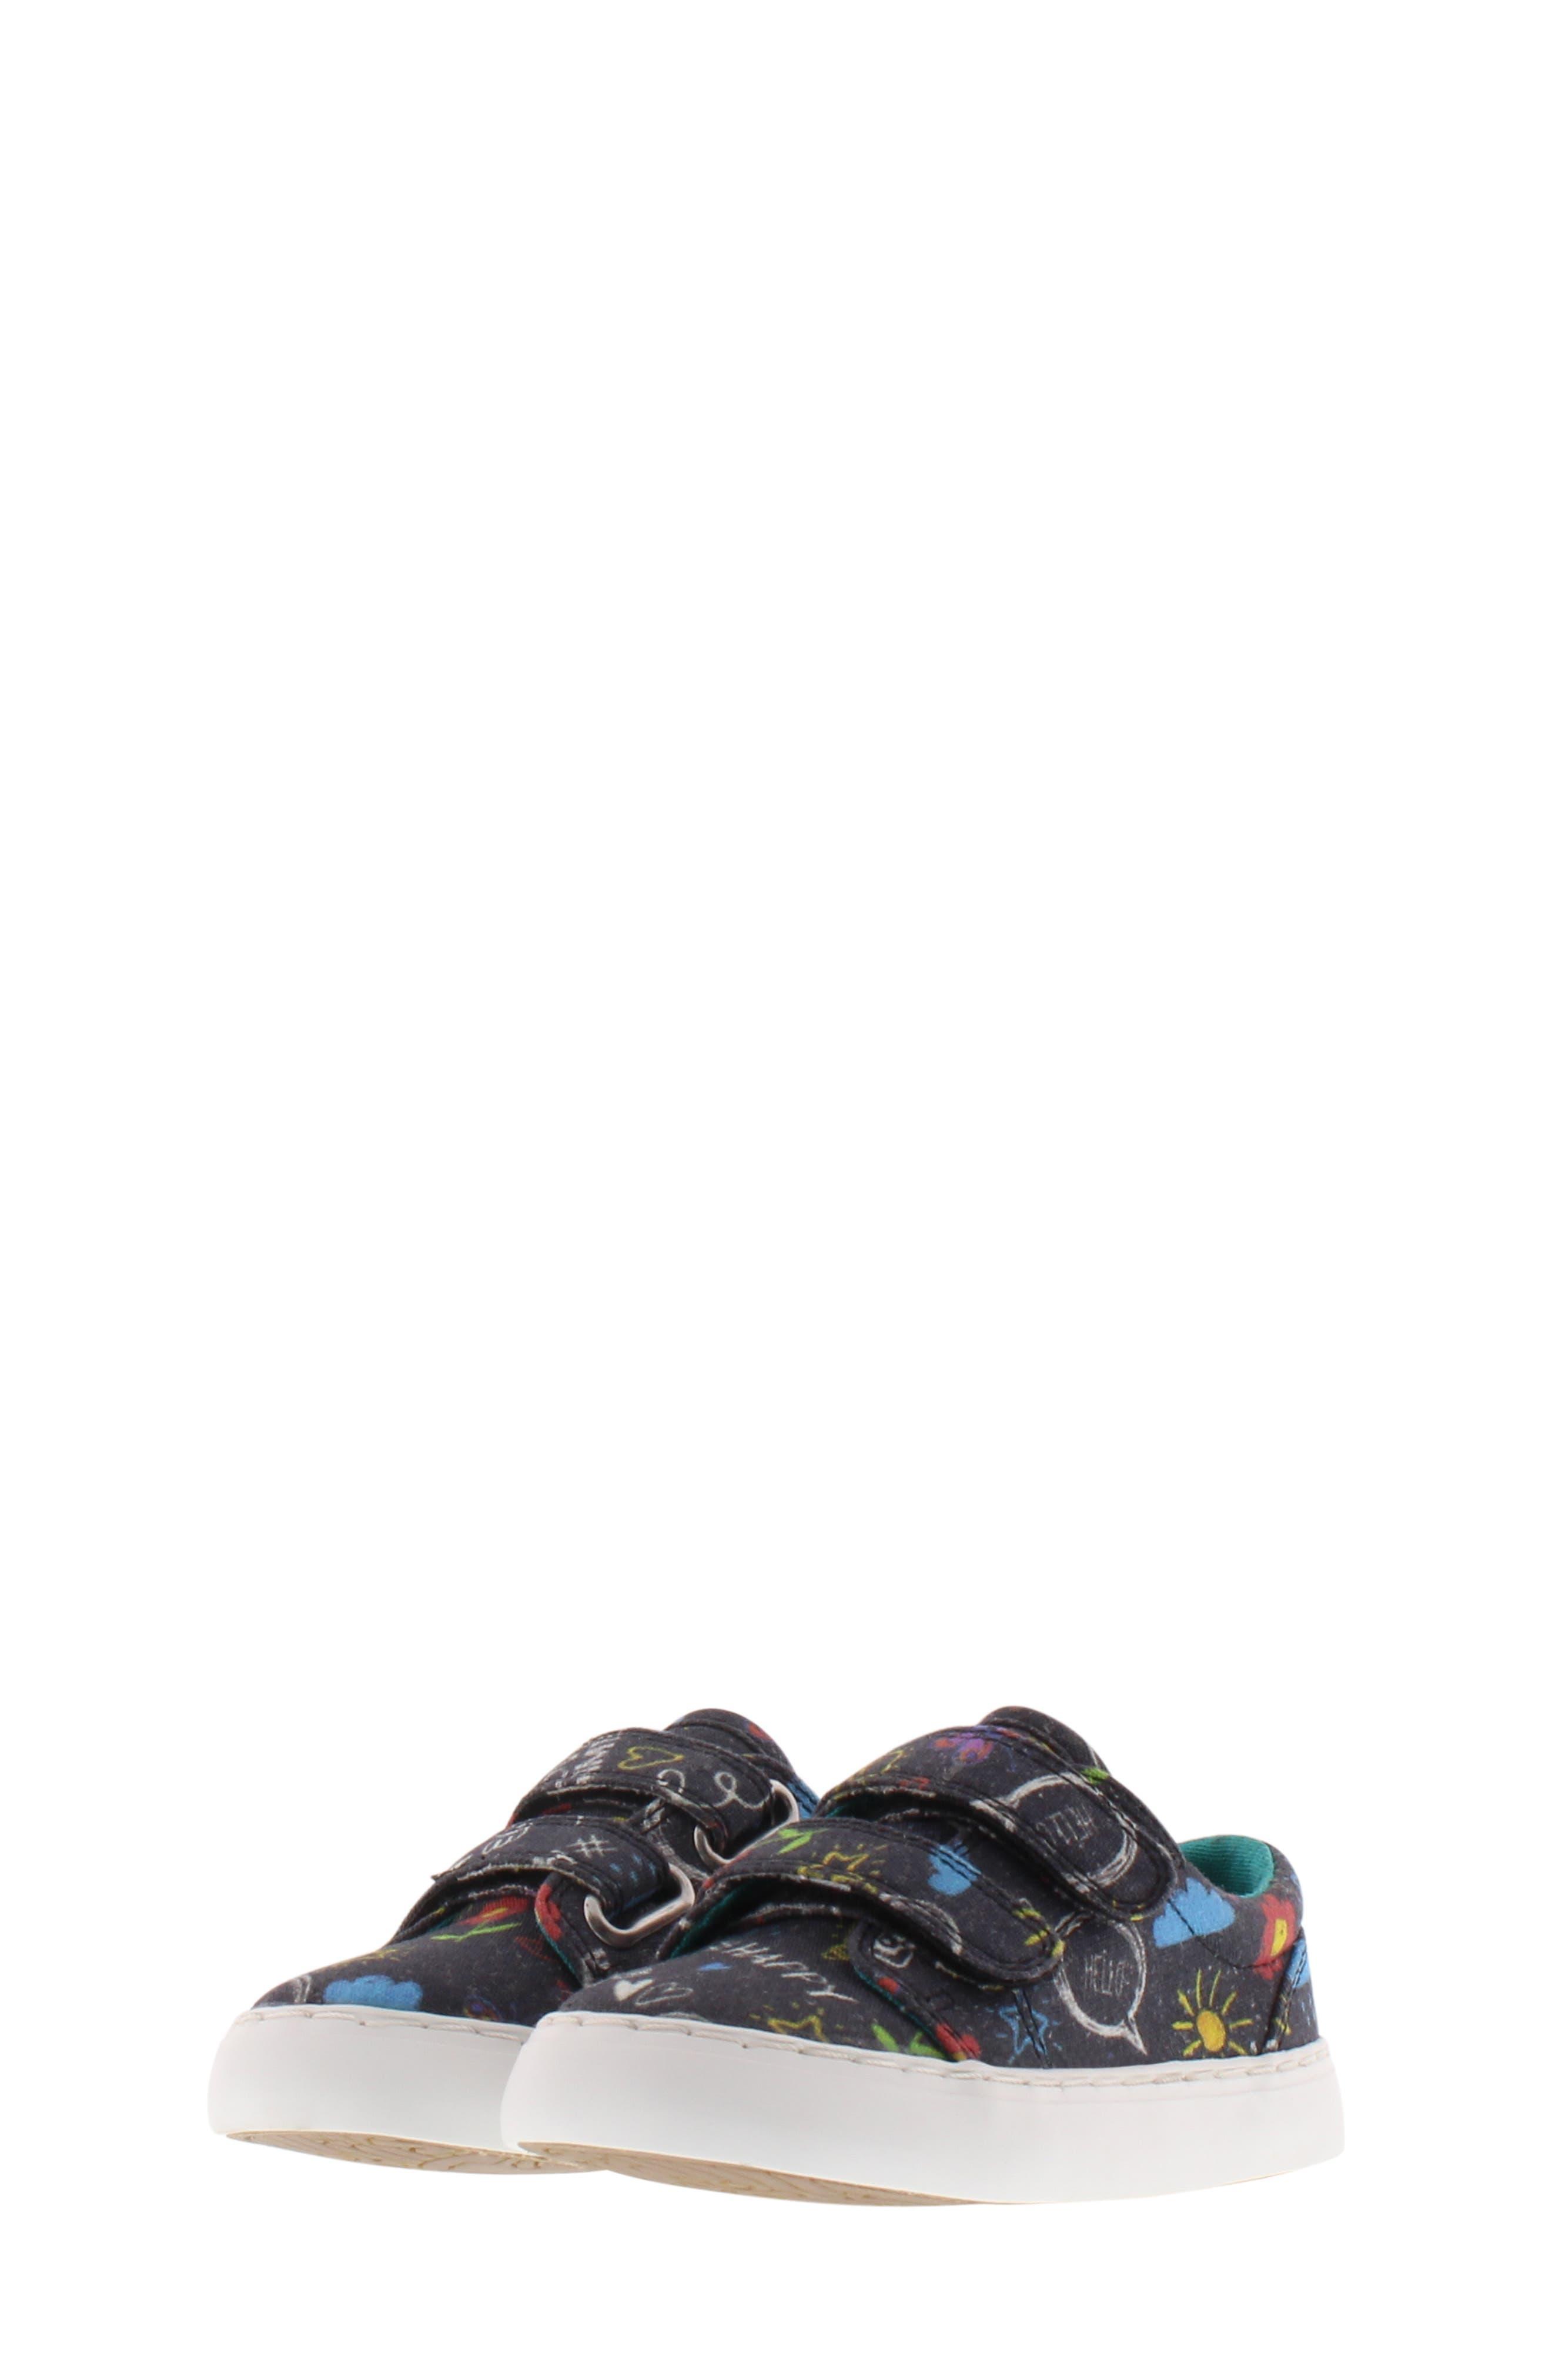 CHOOZE, Choose Move Bounce Sneaker, Alternate thumbnail 8, color, CHARCOAL